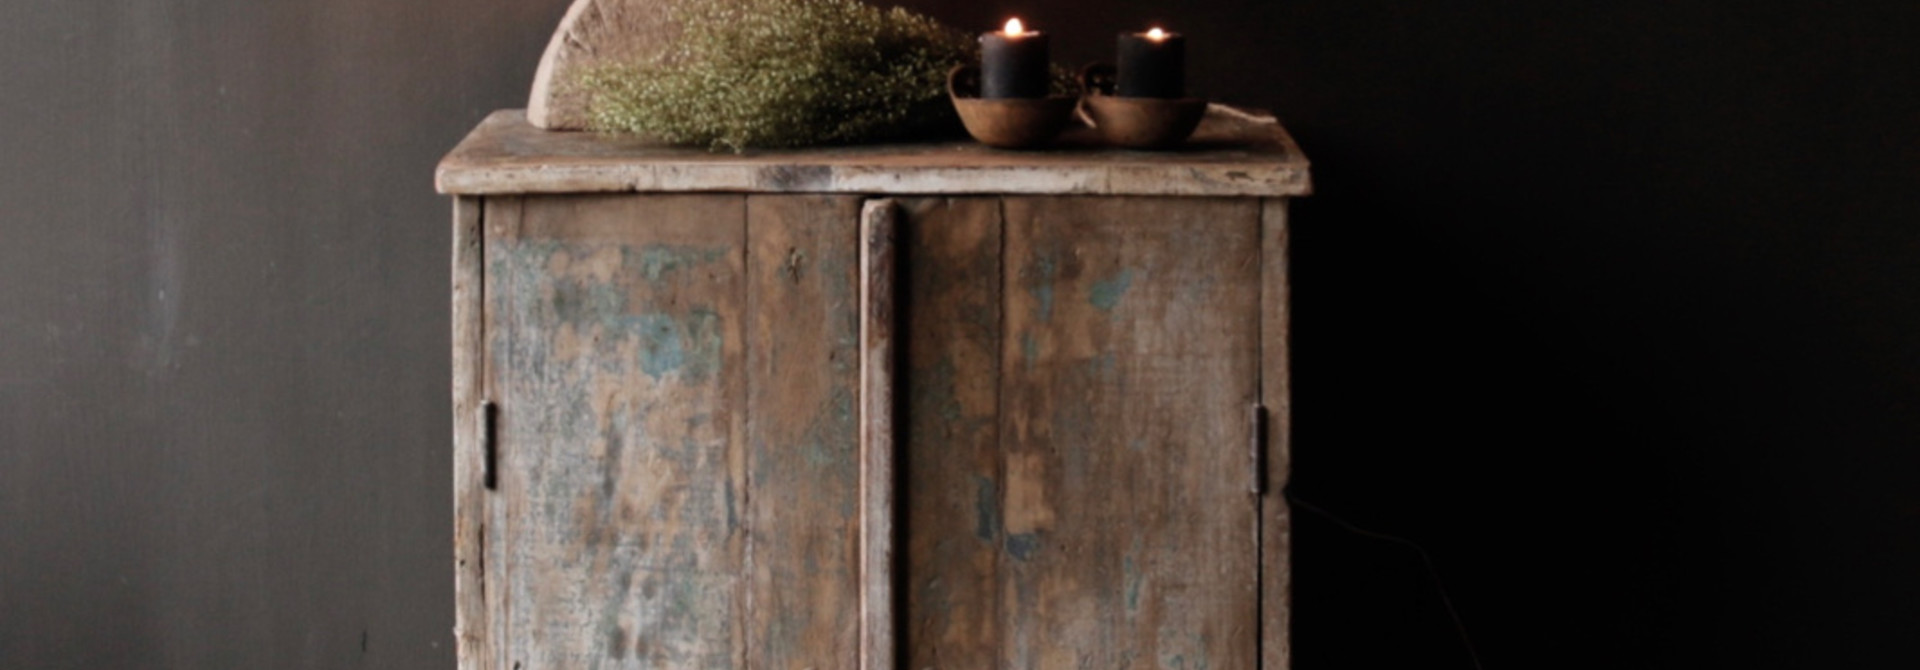 Small Indian cupboard from Aura Peeperkorn